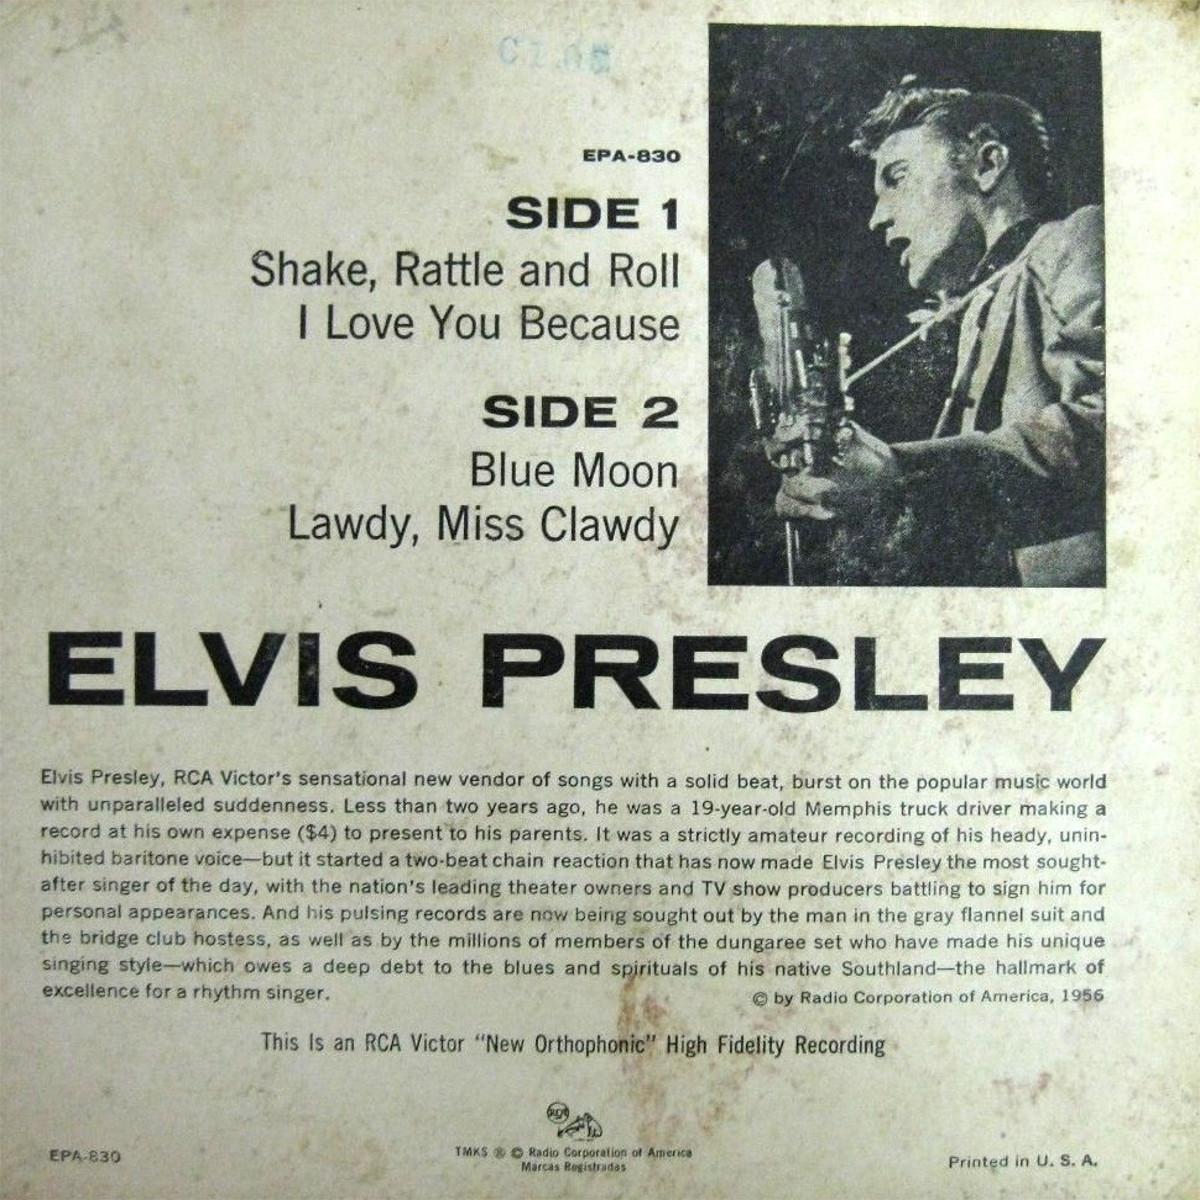 Presley - ELVIS PRESLEY Epa830bfdr5d